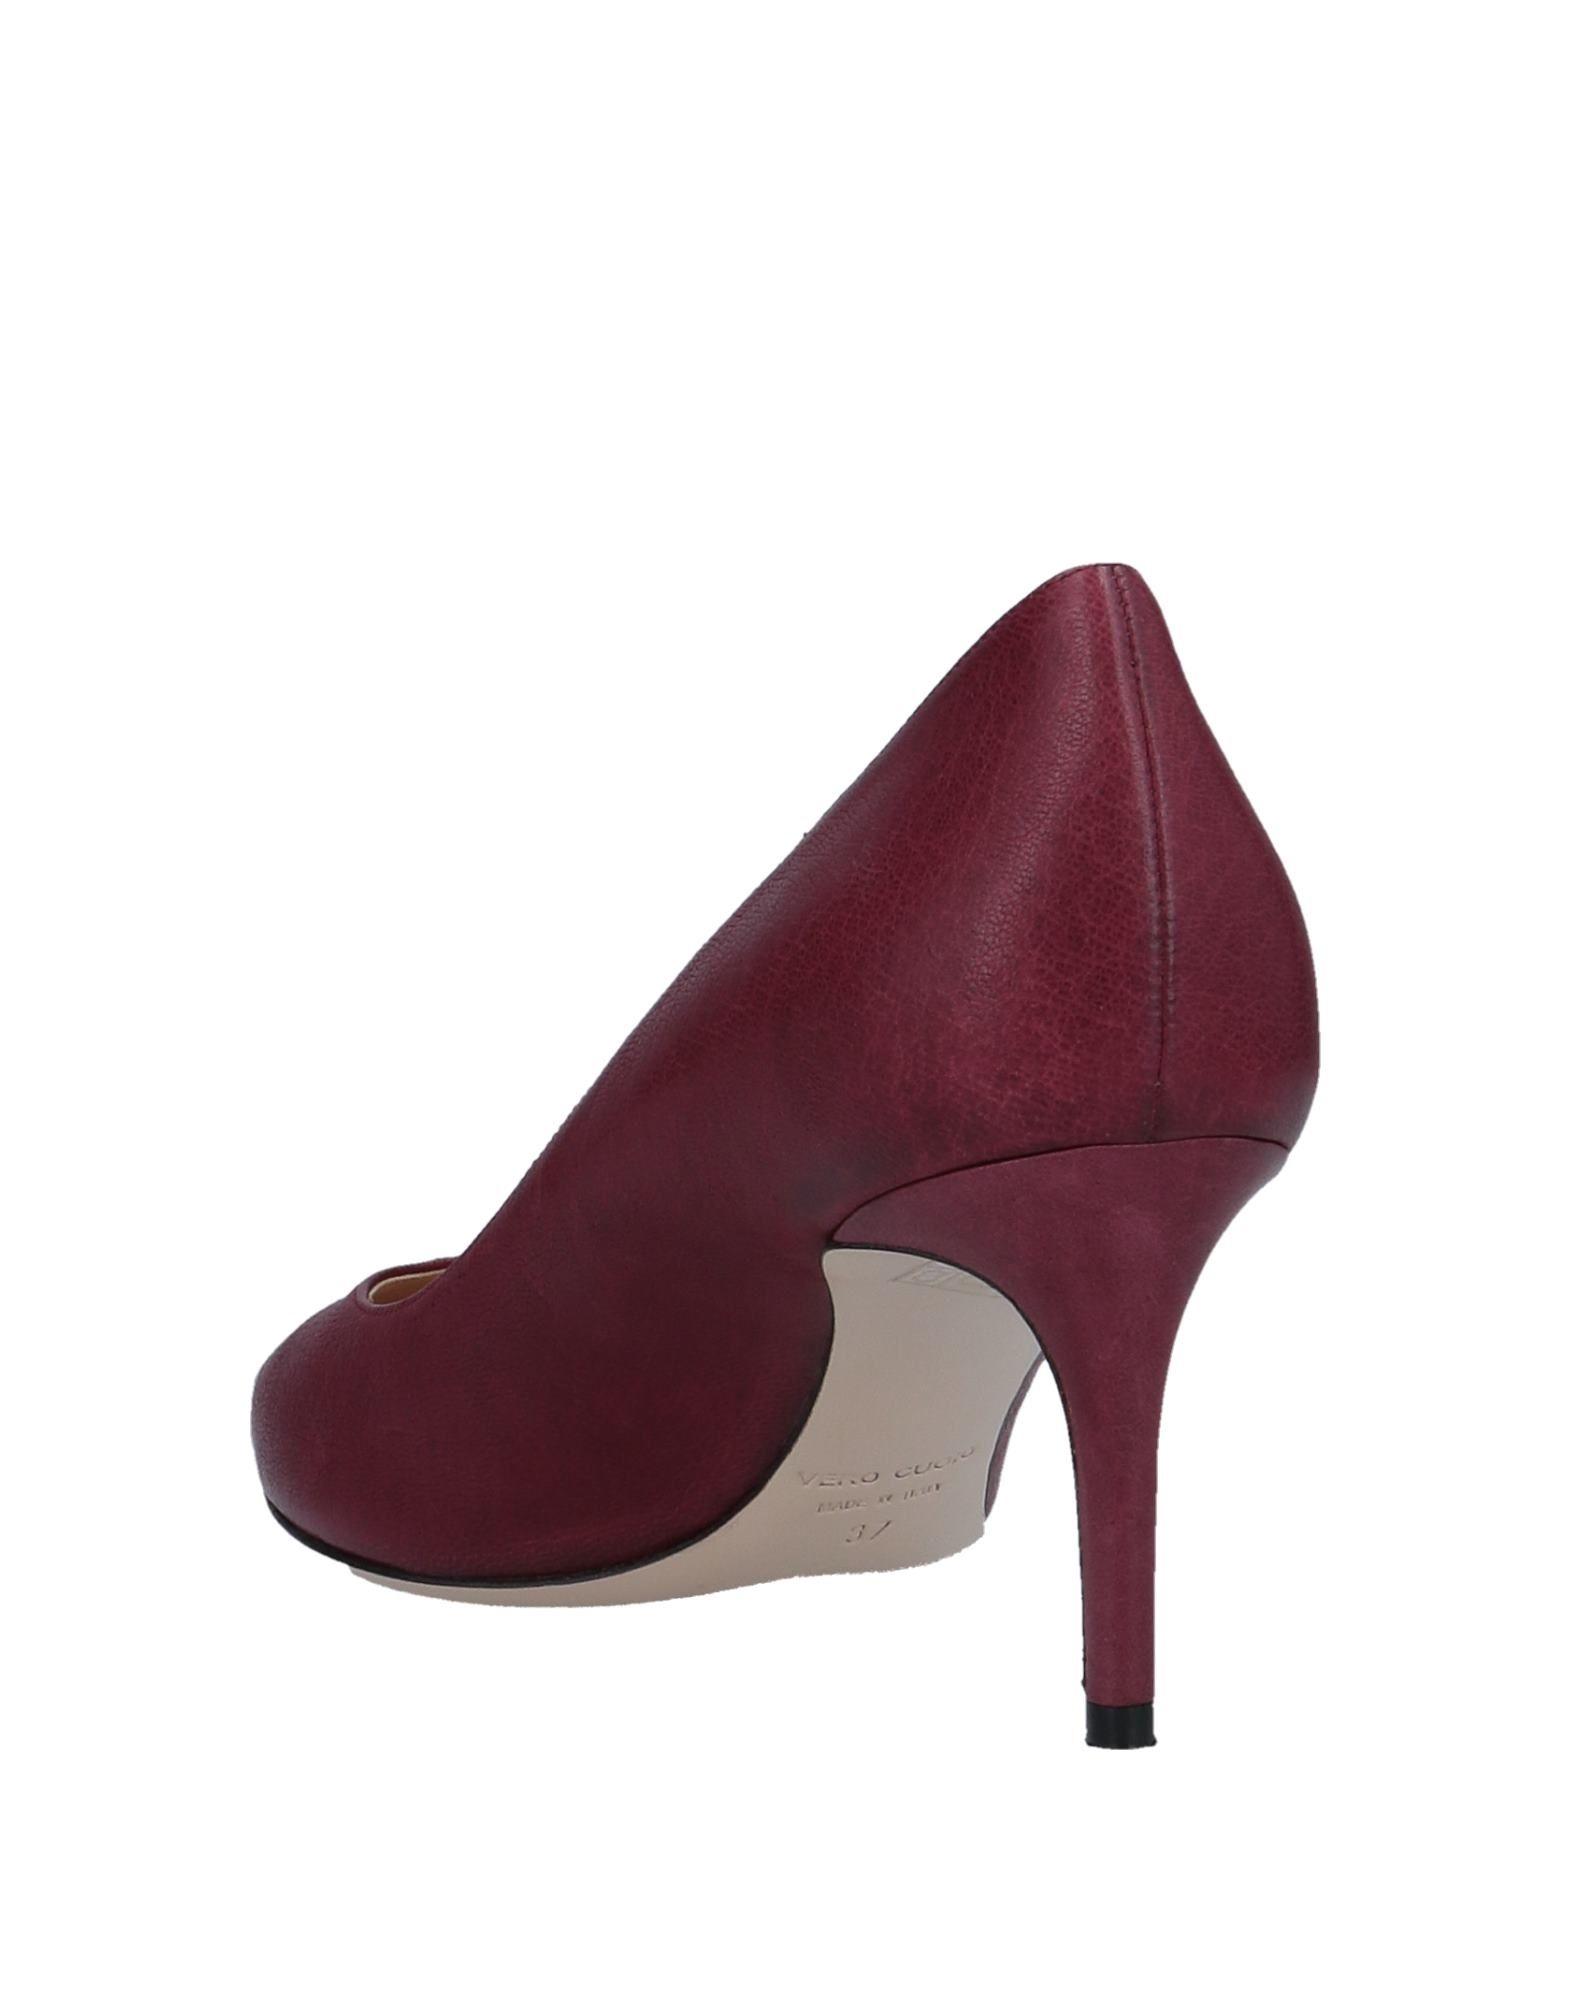 Stilvolle Damen billige Schuhe Deimille Pumps Damen Stilvolle  11556304AS 820c6a